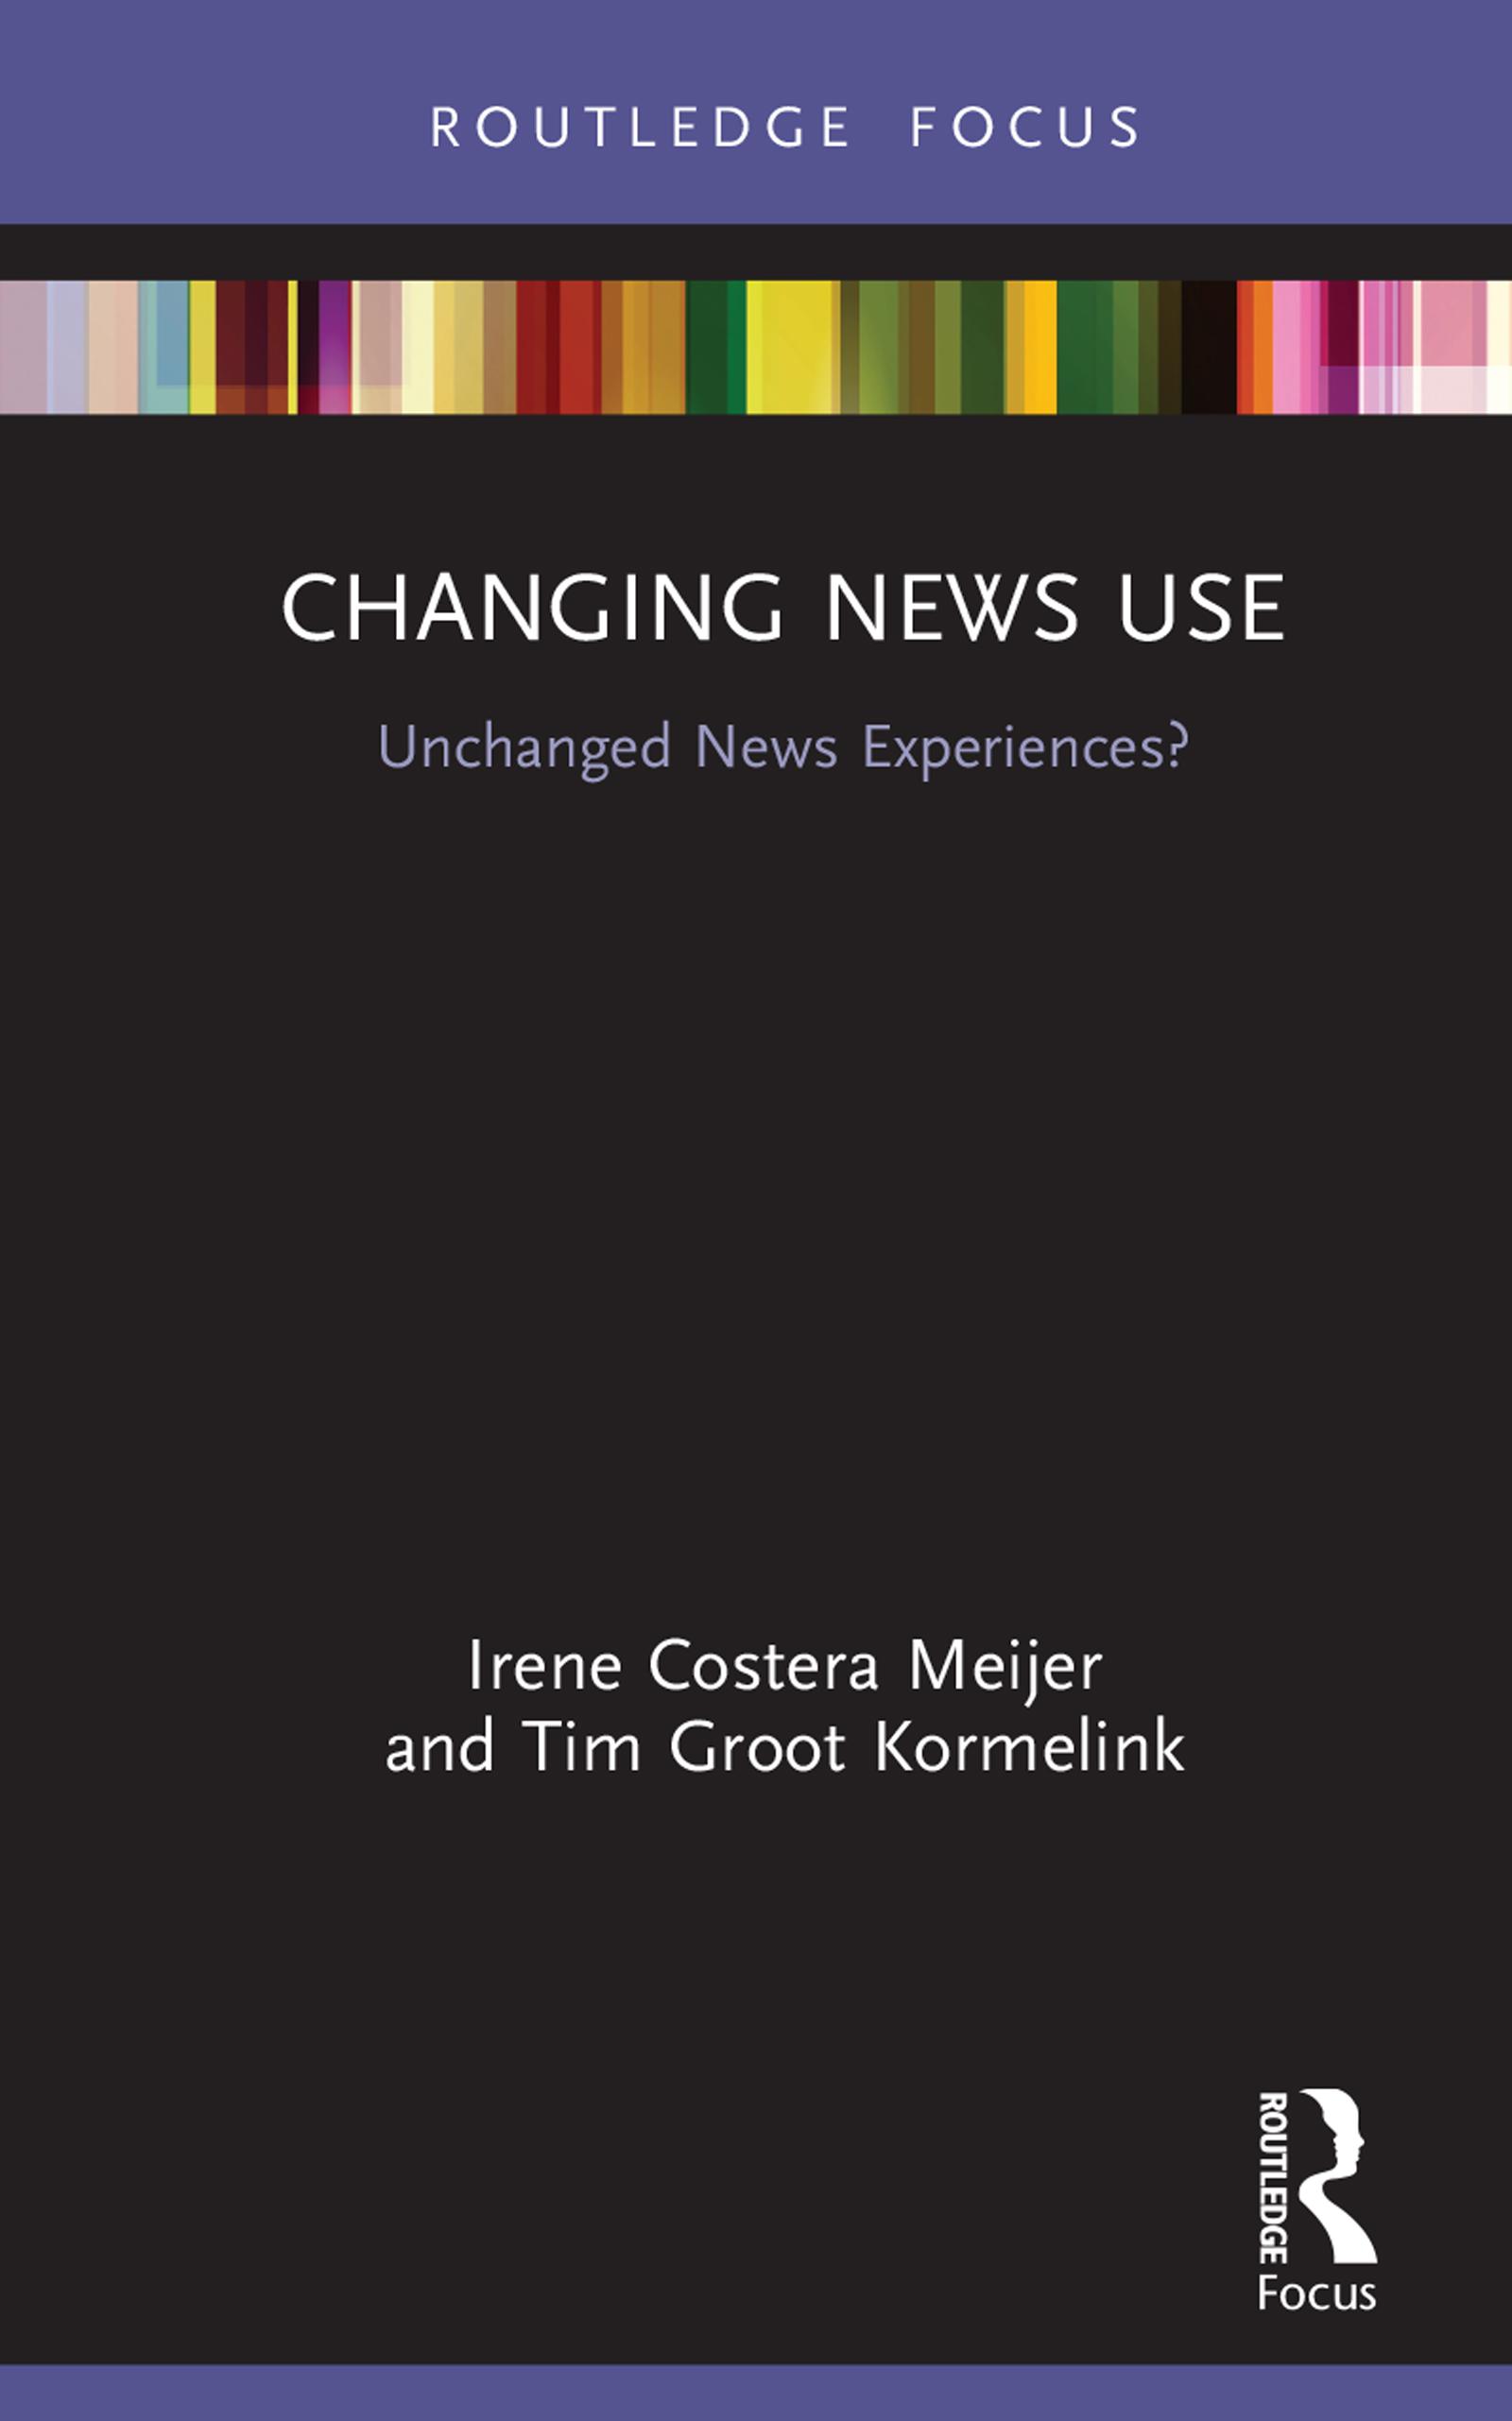 Changing News Use